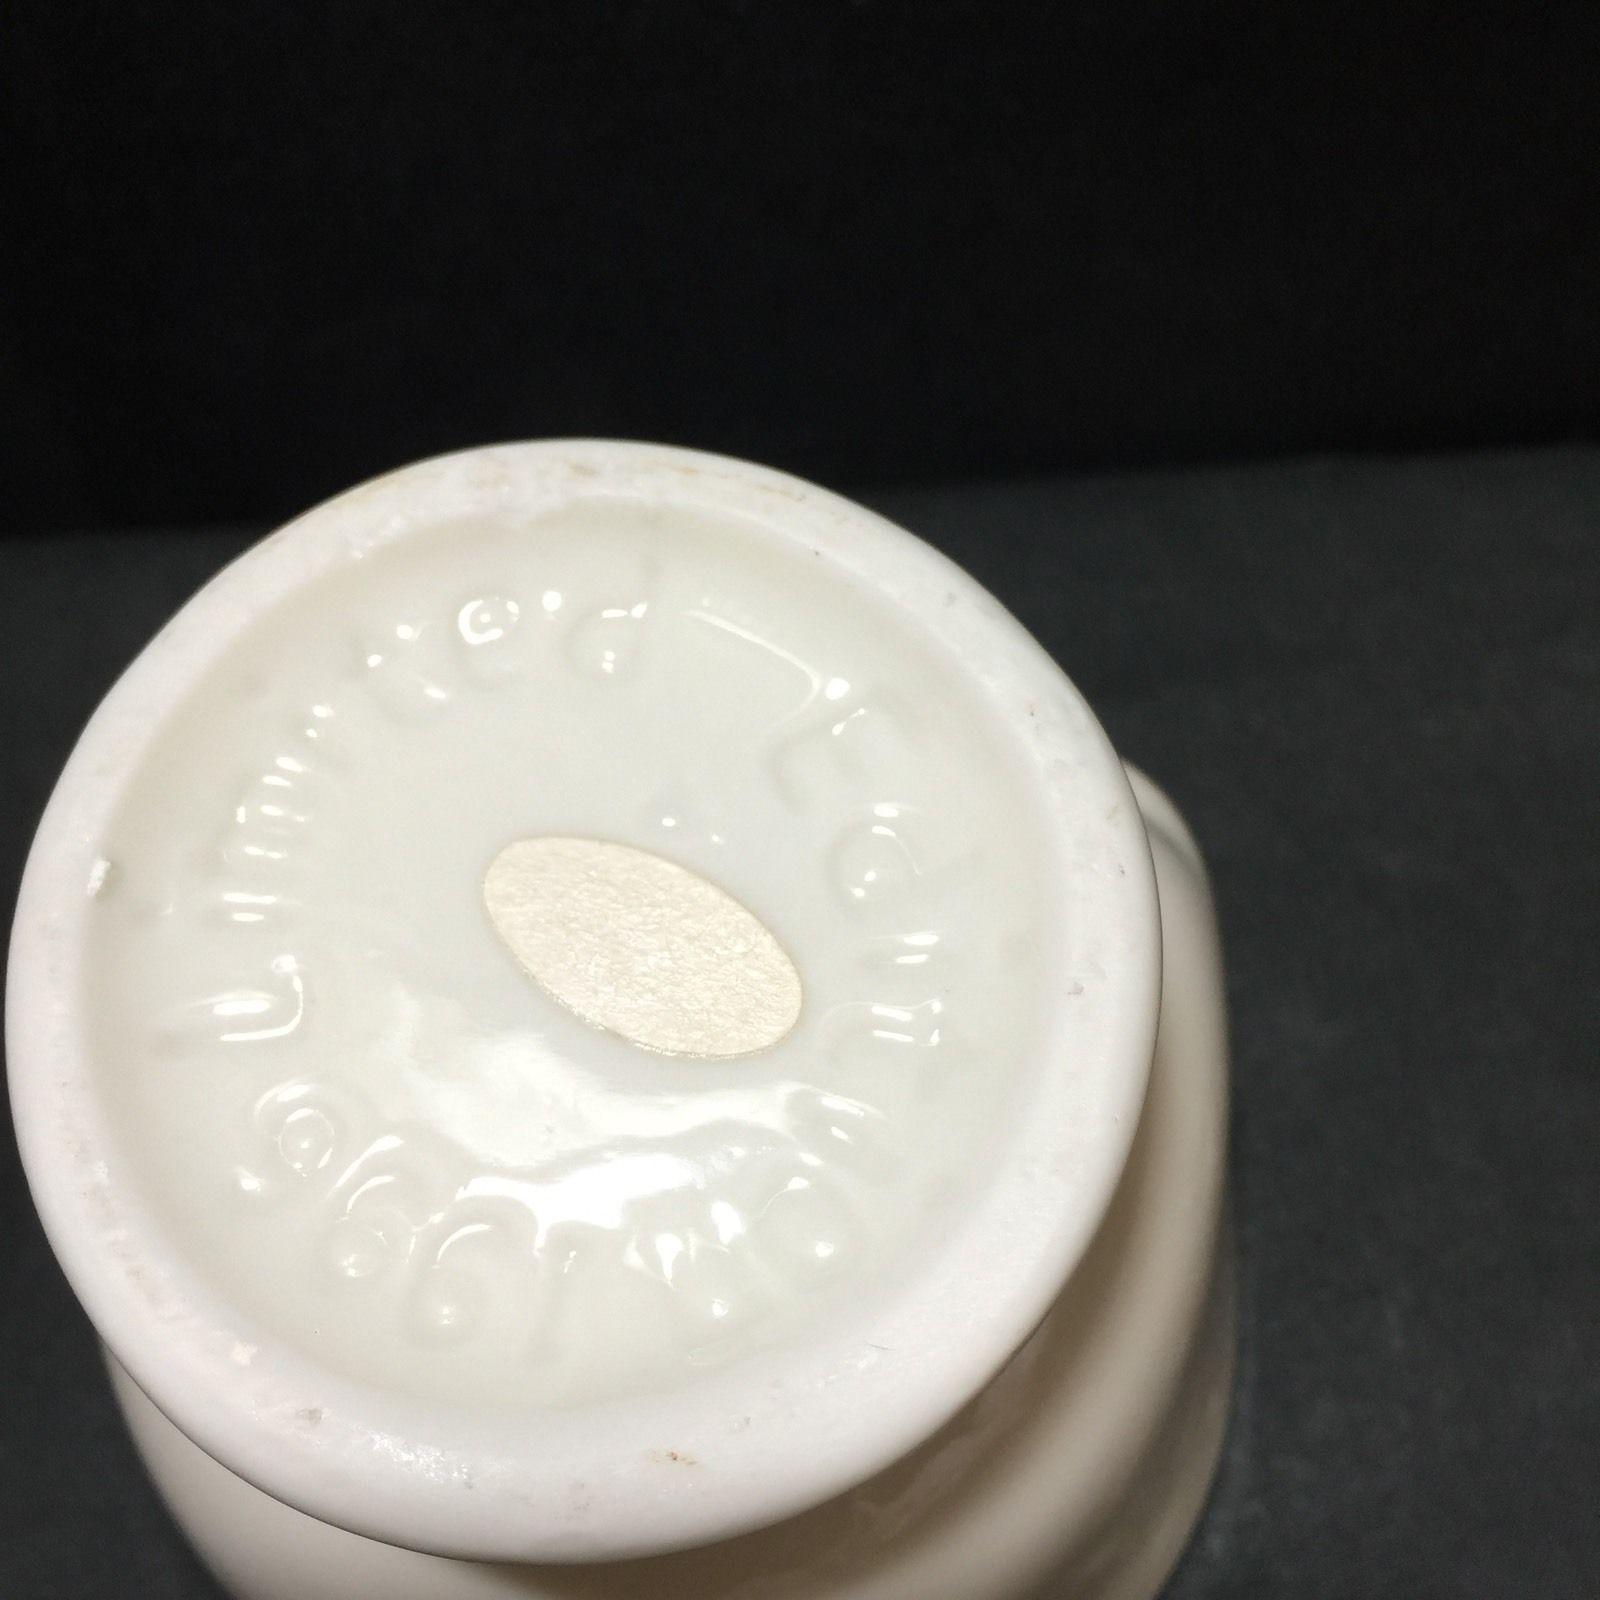 Limited Edition Baileys Irish Cream Face Wink Ceramic Cup Vintage 1996